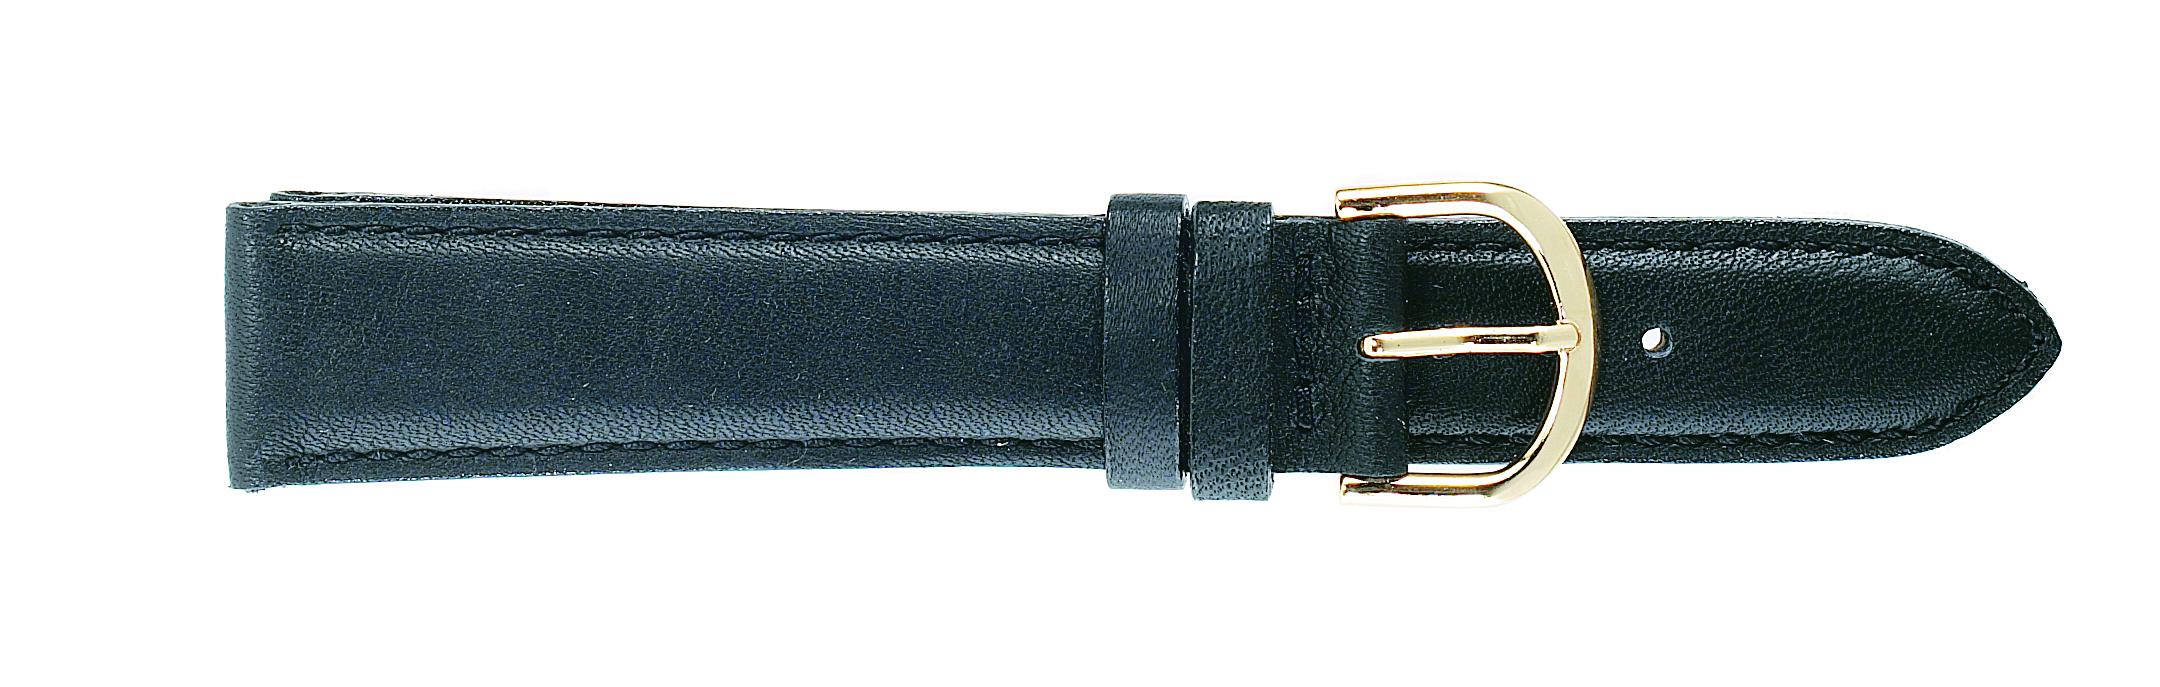 20mm Padded Calf Black Strap Long -0